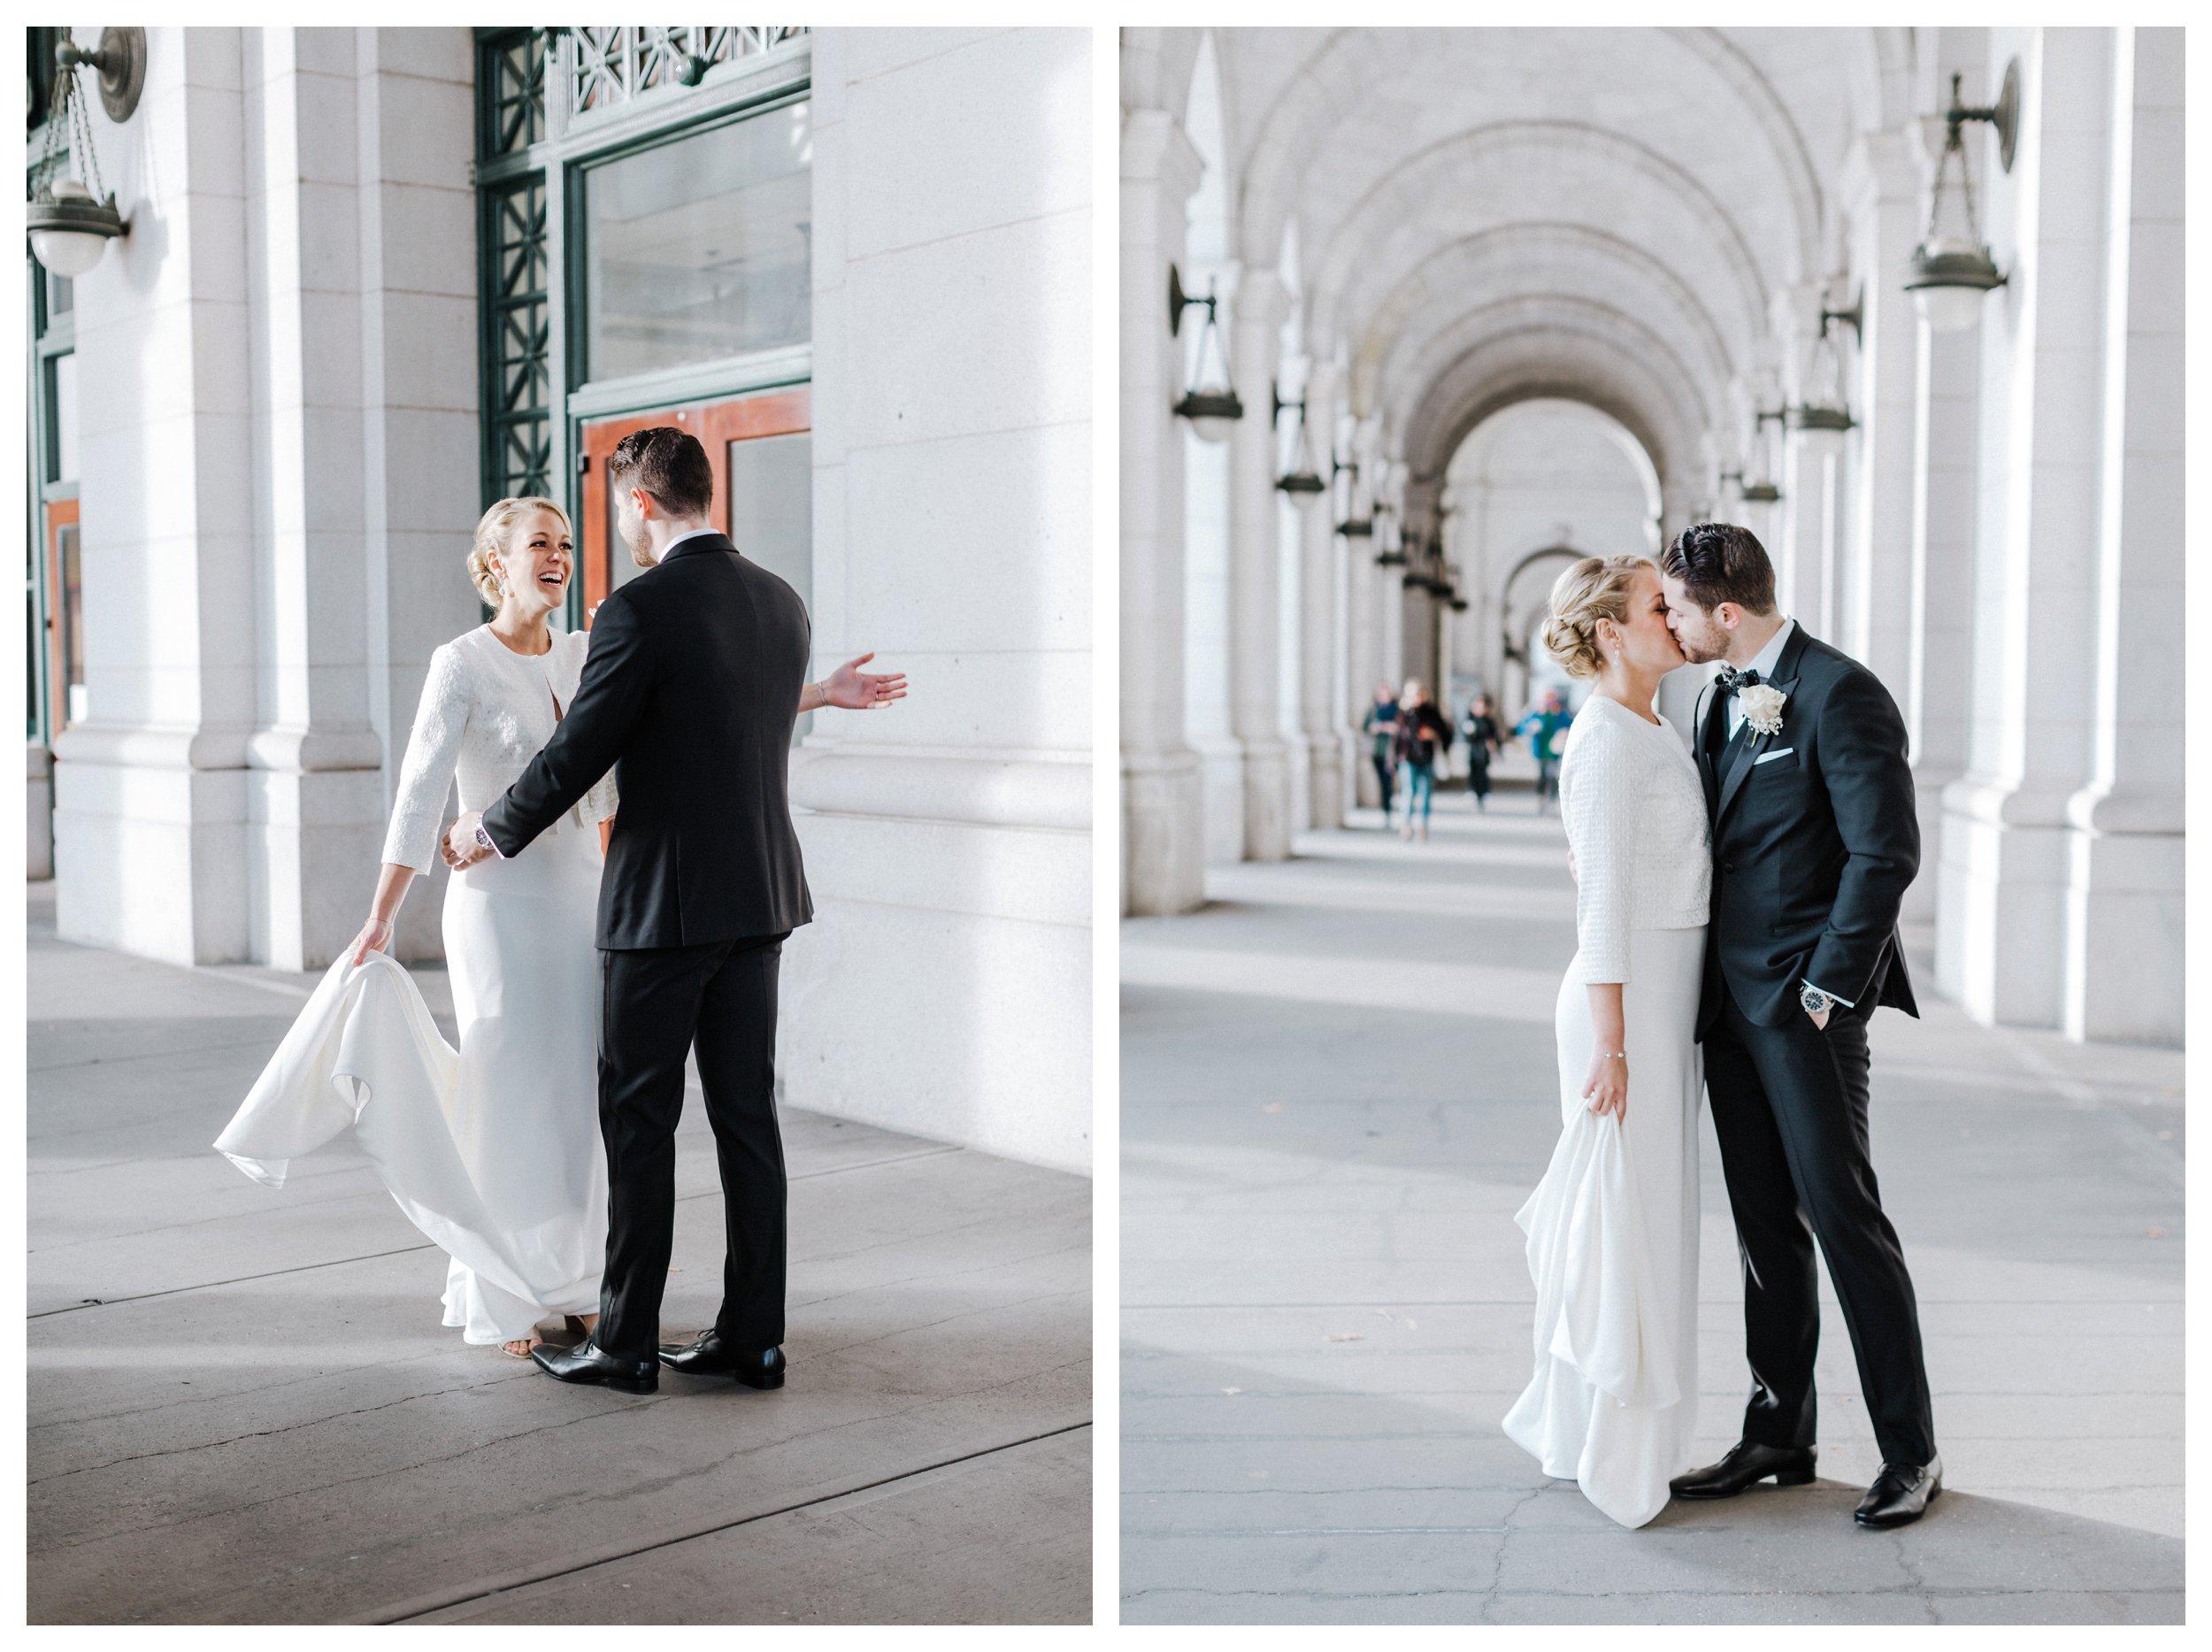 washington-dc-wedding-photographer-10.JPG